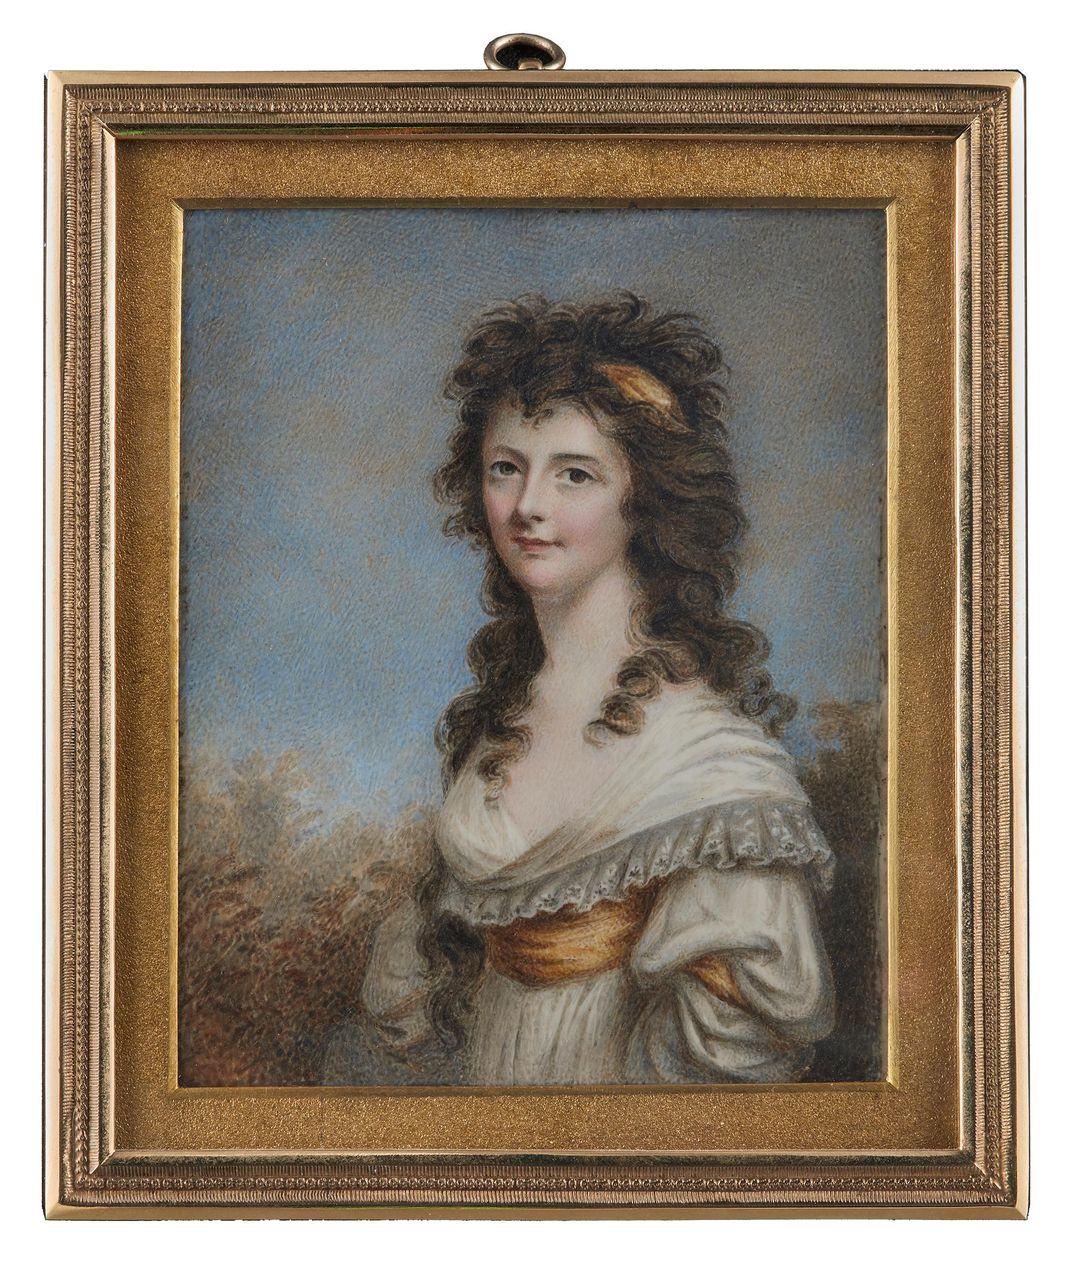 Spotlighting 500 Years of Women in British Art, From Tudor Portraitists to the Bloomsbury Group